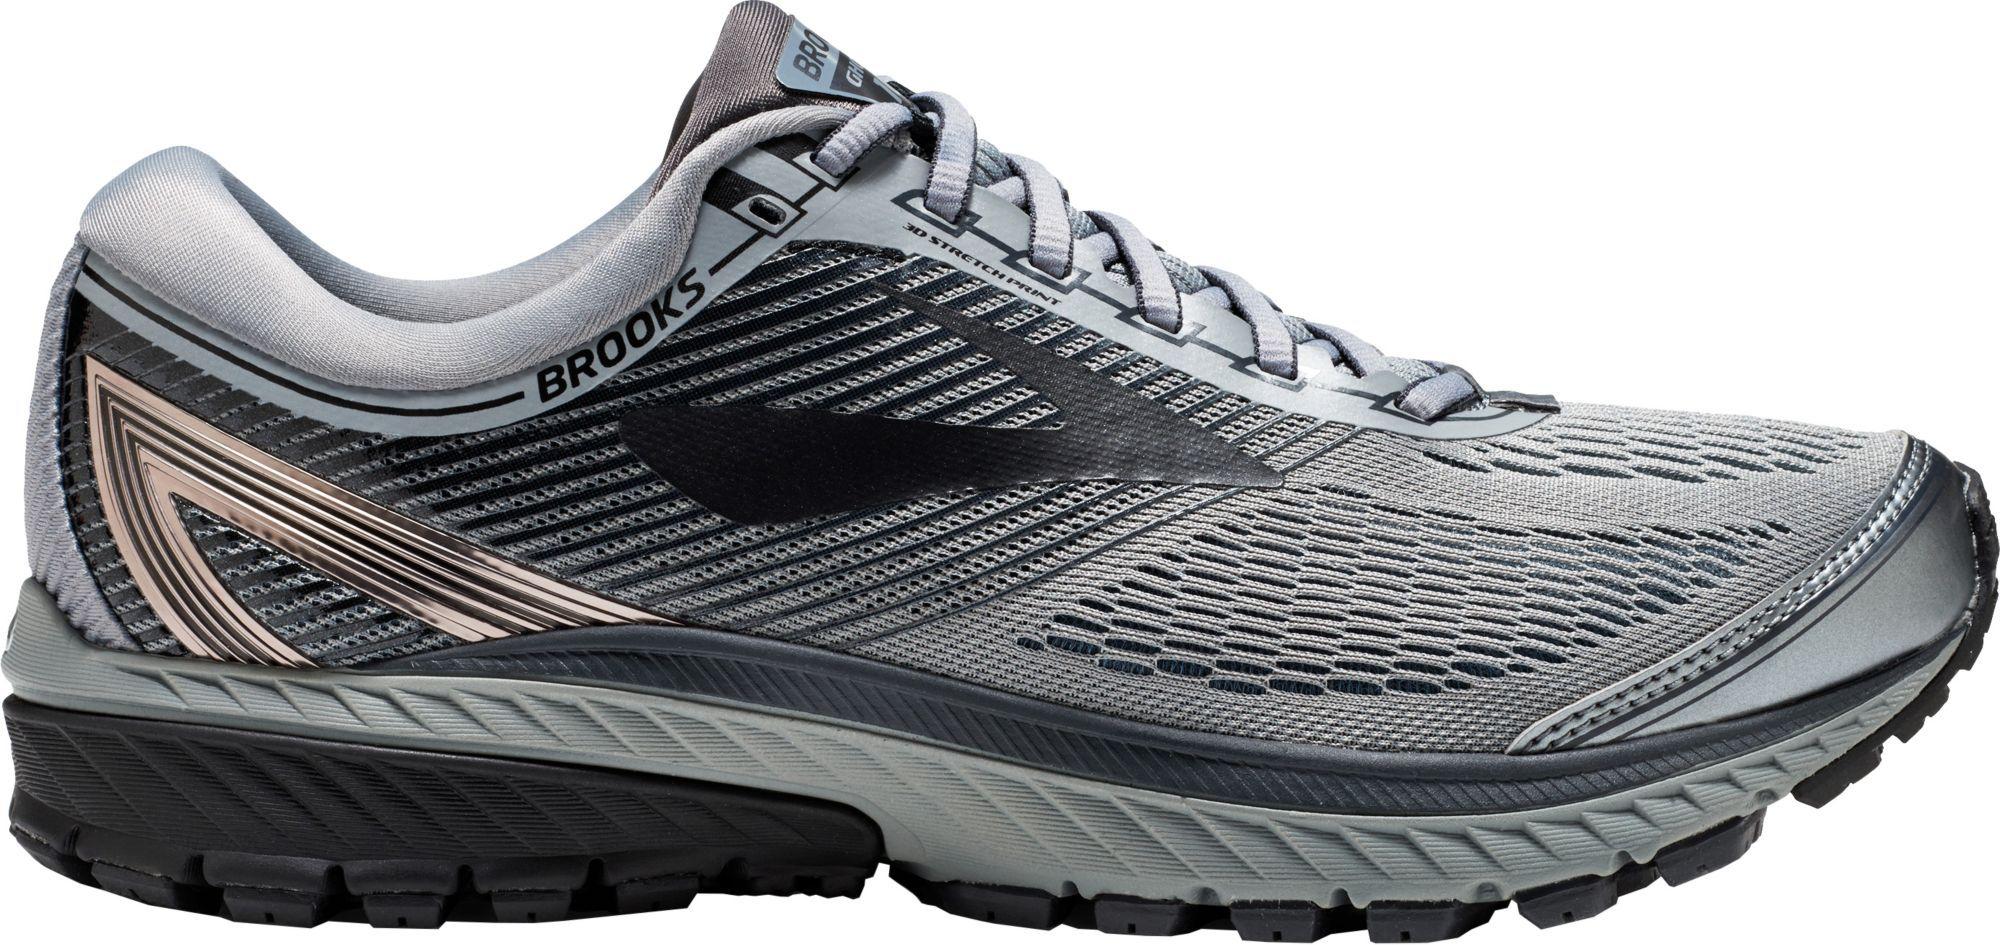 52013d949c1 Brooks Men s Ghost 10 Running Shoes